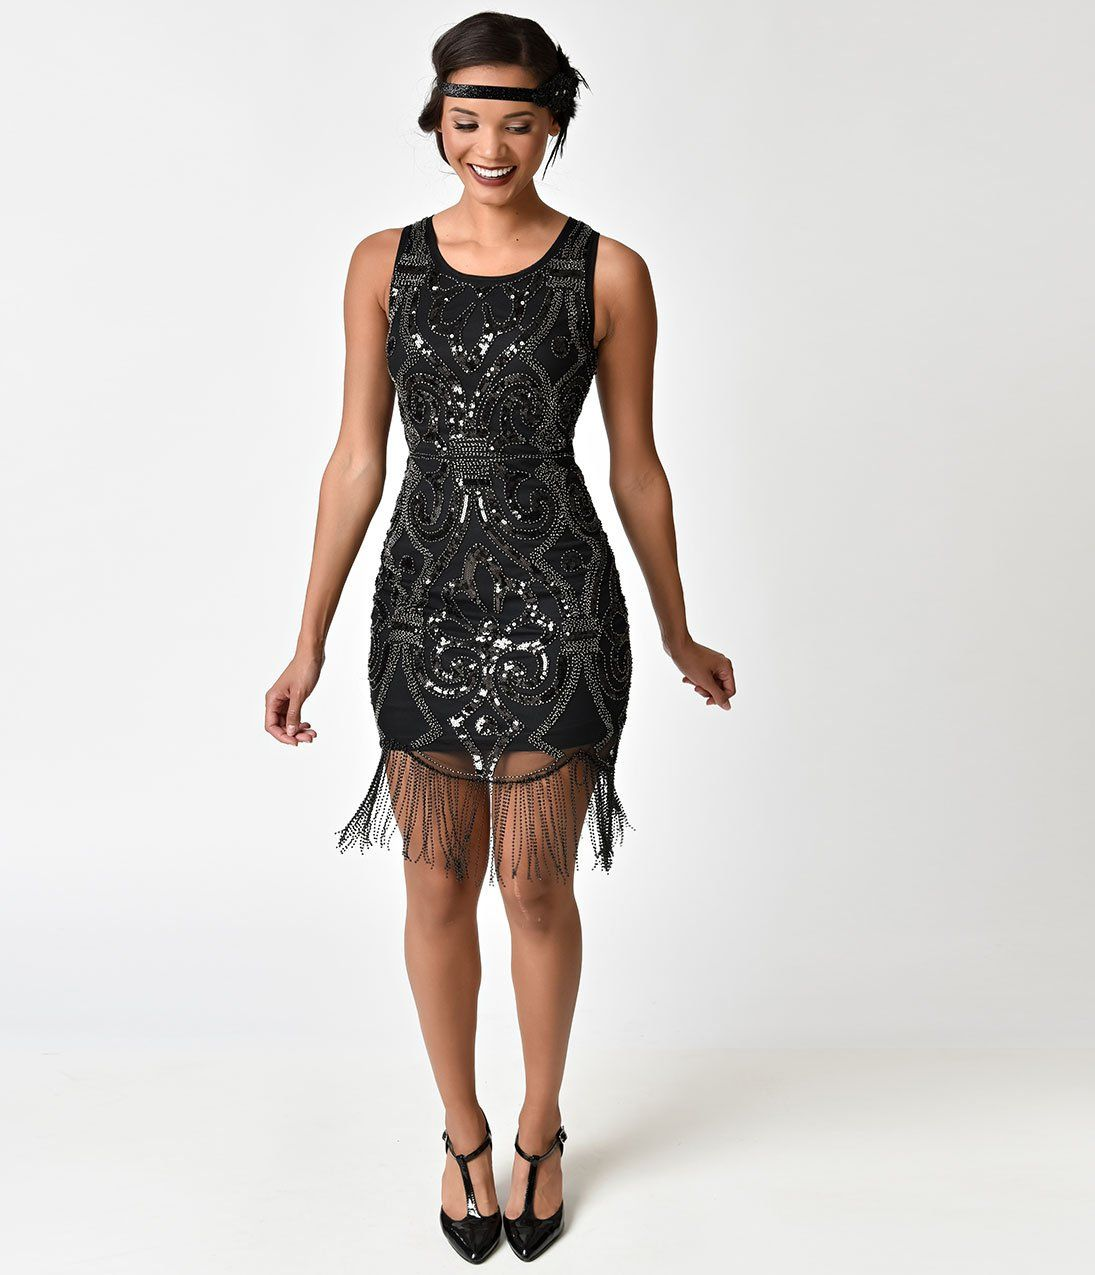 S style black sequin u gunmetal beaded fringe cocktail dress in